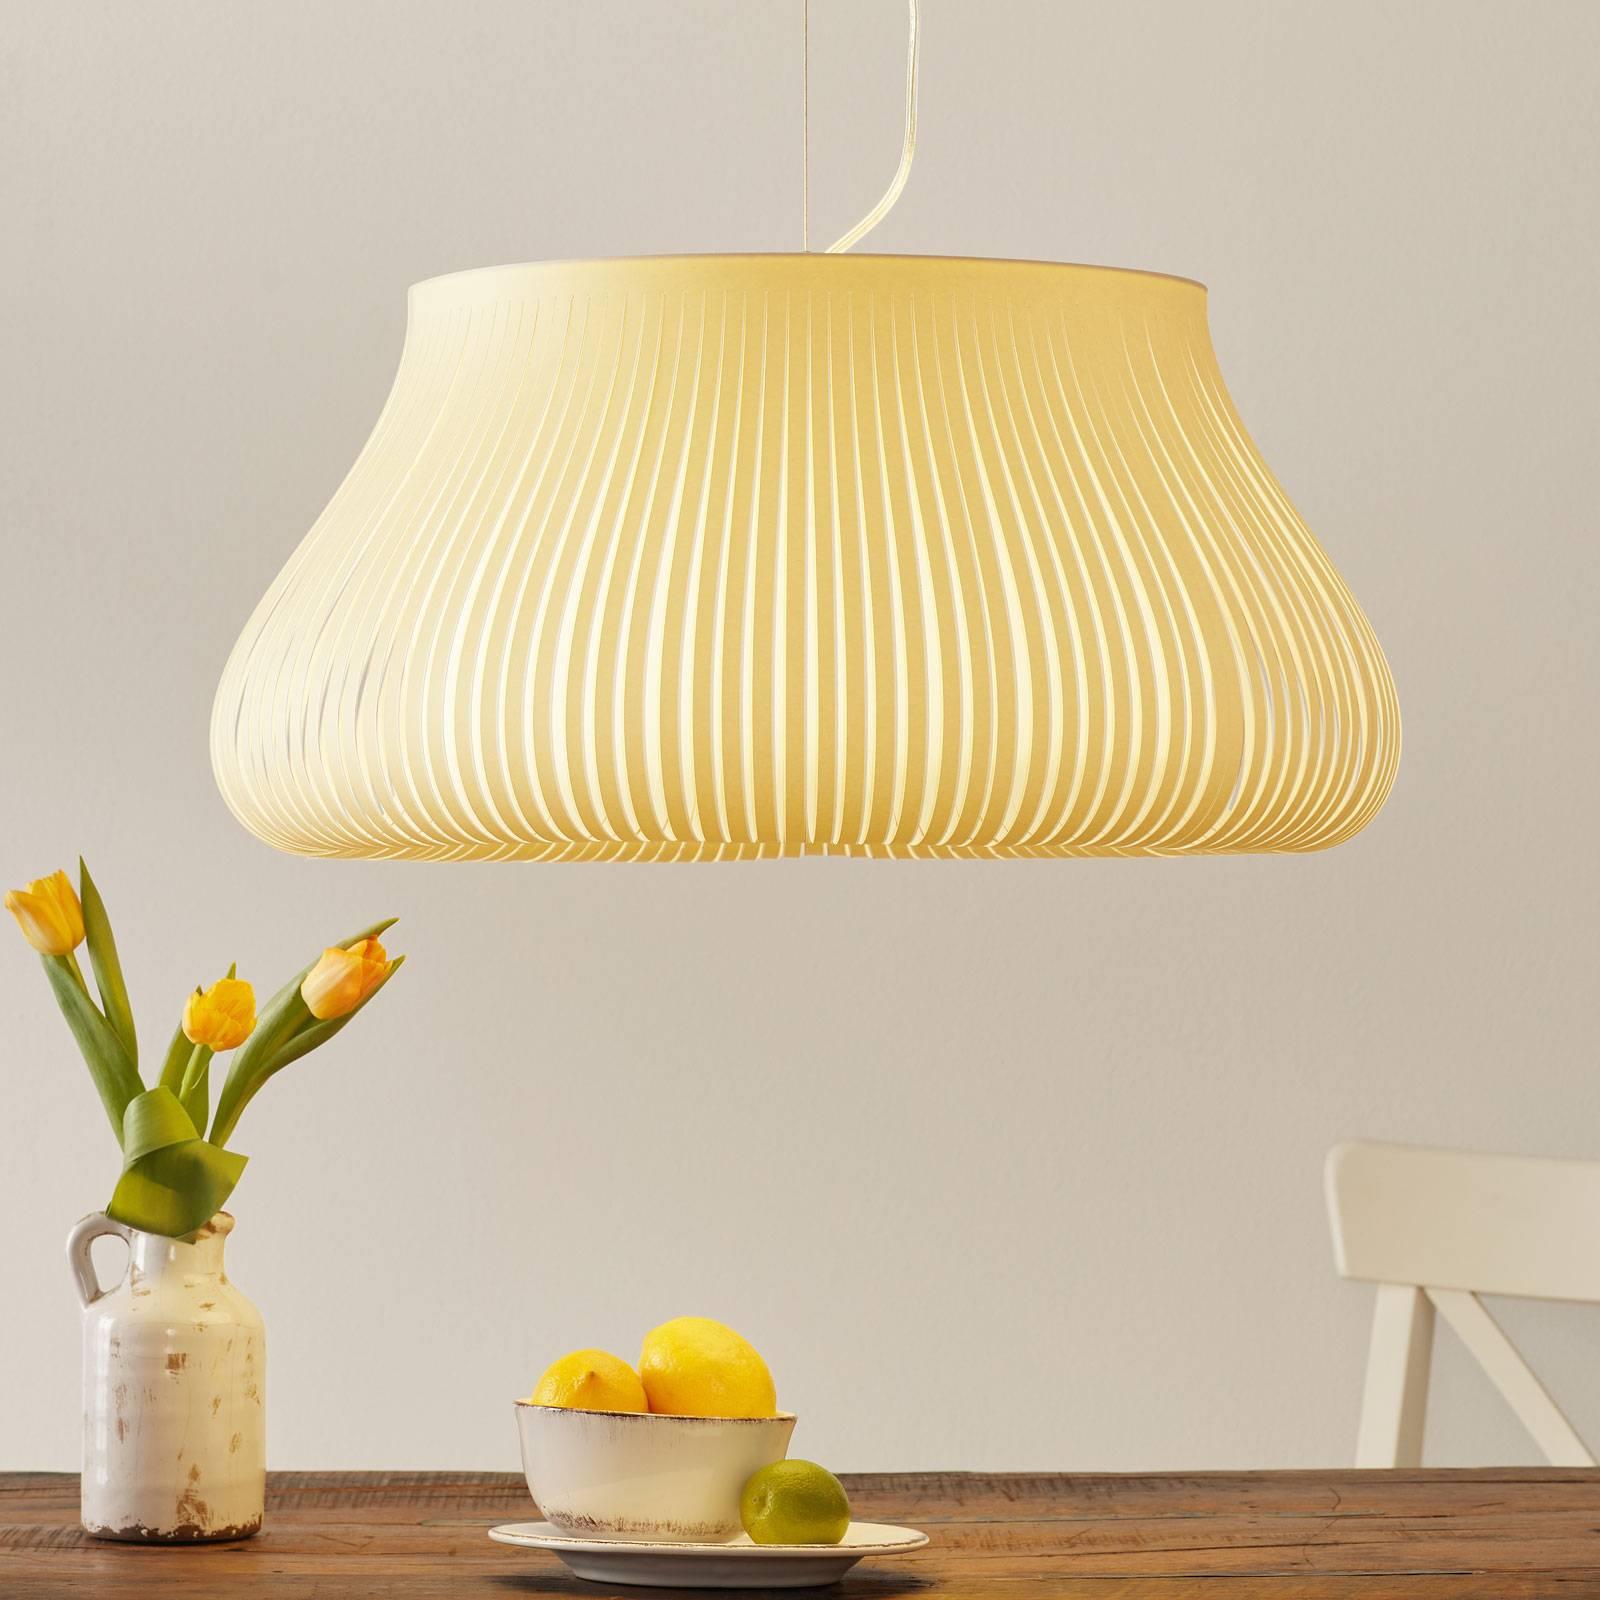 Hanglamp Nanok met 1 lampje